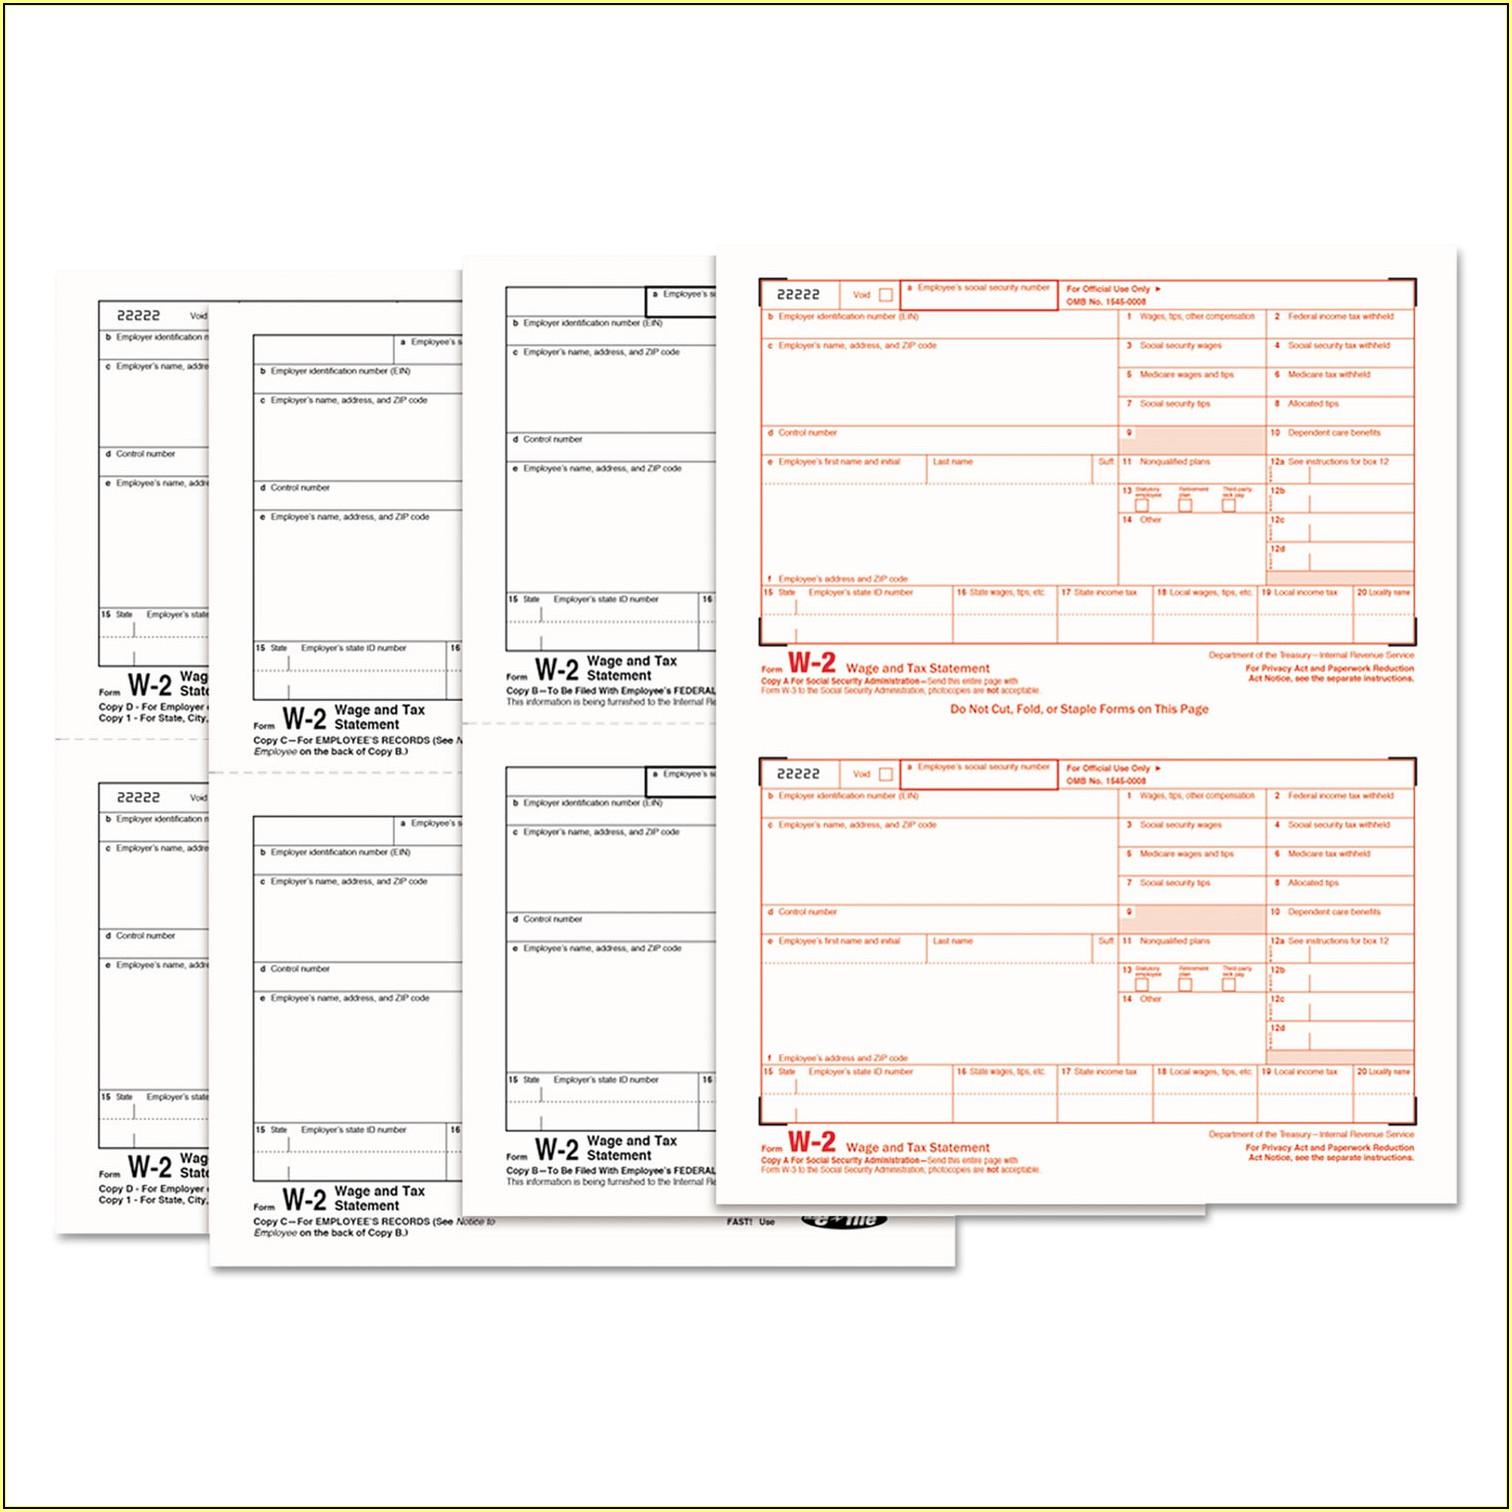 Tax Forms W2 Online